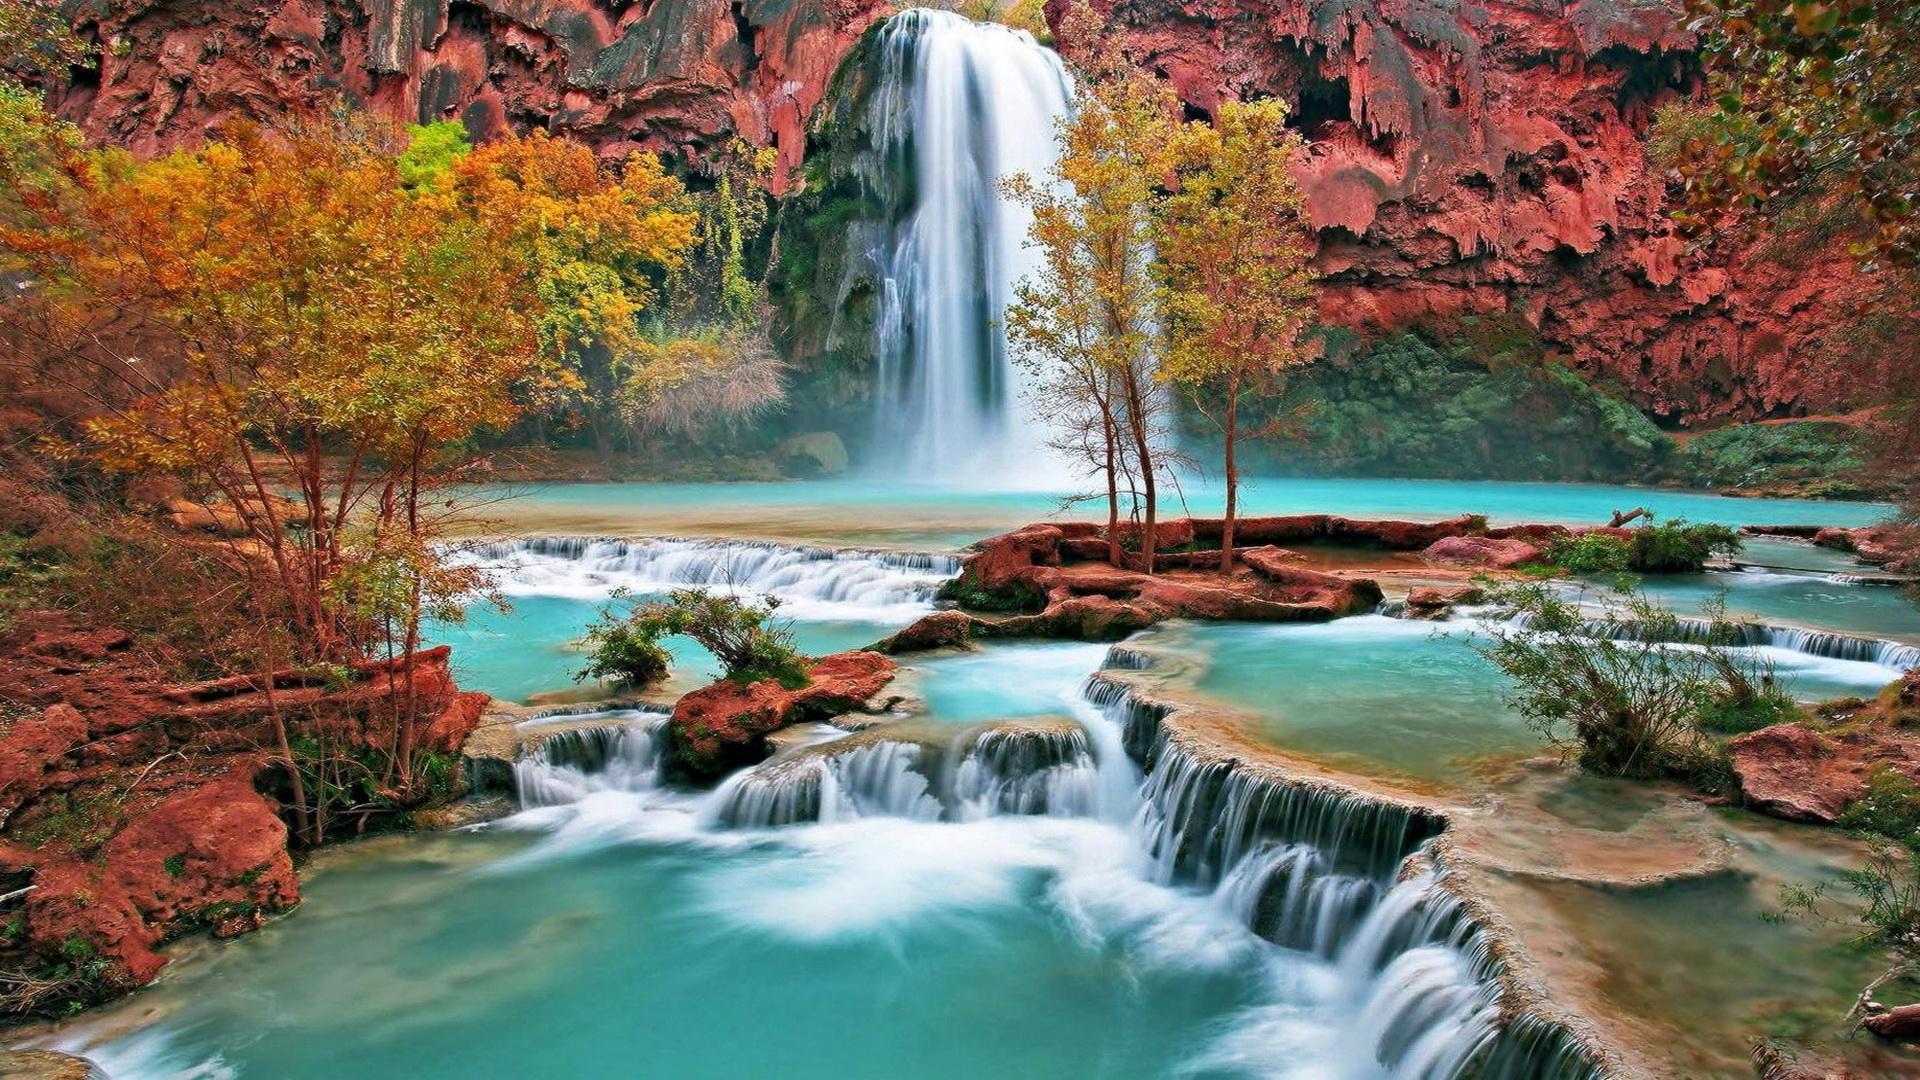 Beautiful autumn waterfall wallpaper hd 1080p hd desktop fond ecran hd 1920x1080